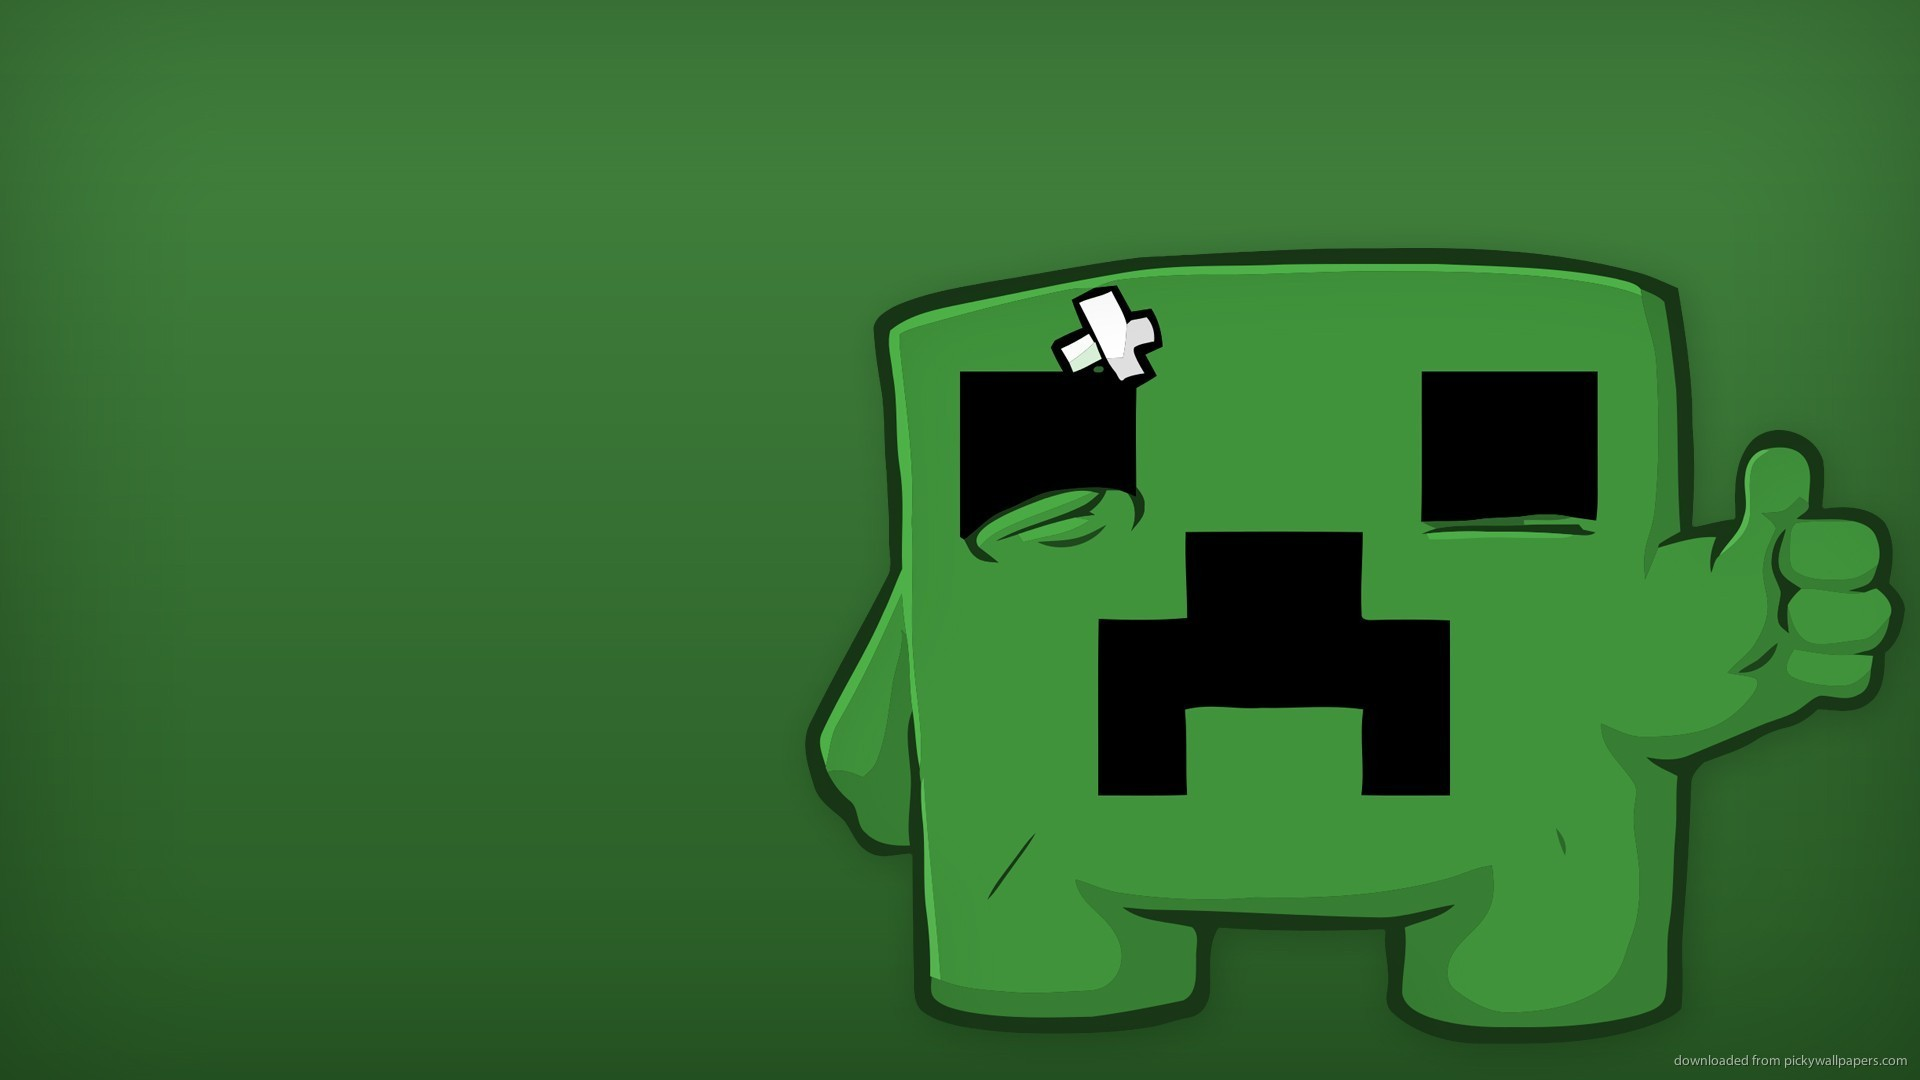 Minecraft Creeper wallpaper 182511 1920x1080